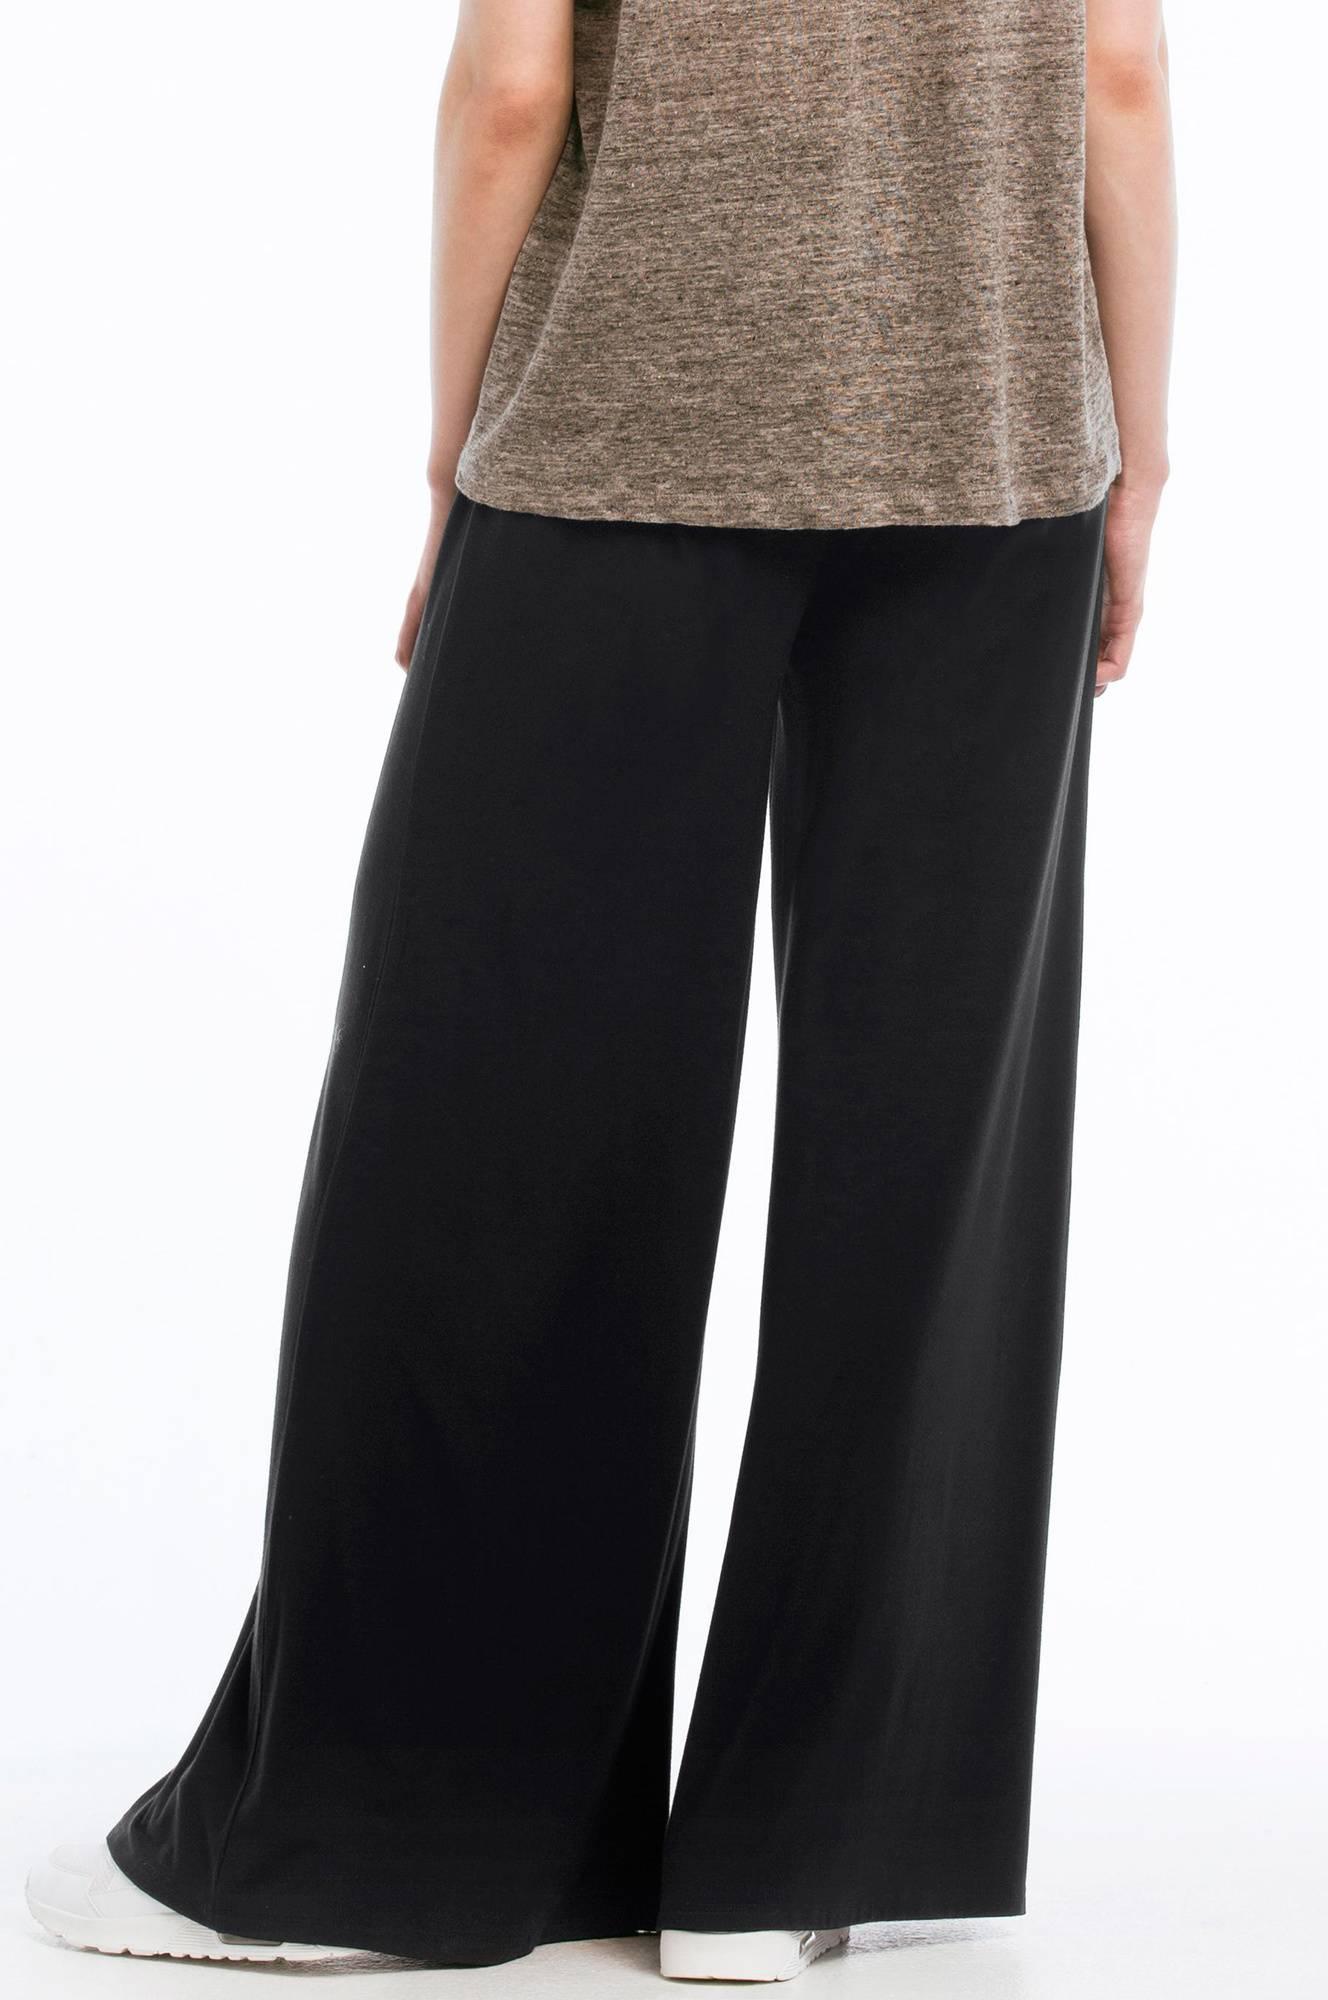 Ellos Collection Bukse med vide ben Svart Trikotbukser